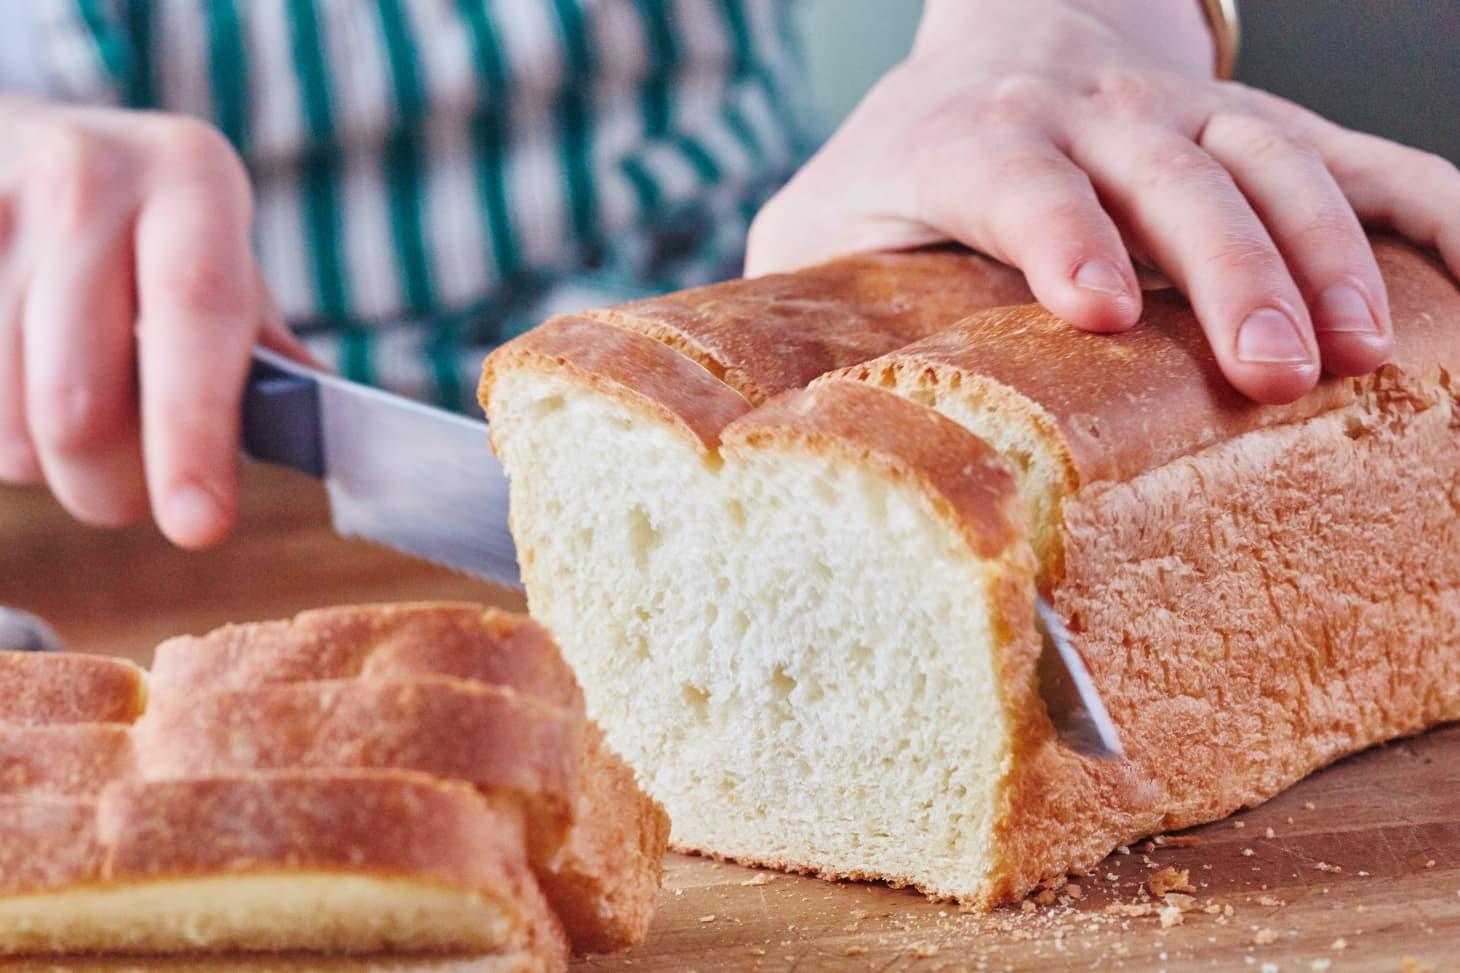 How To Make Basic White Sandwich Bread | Kitchn